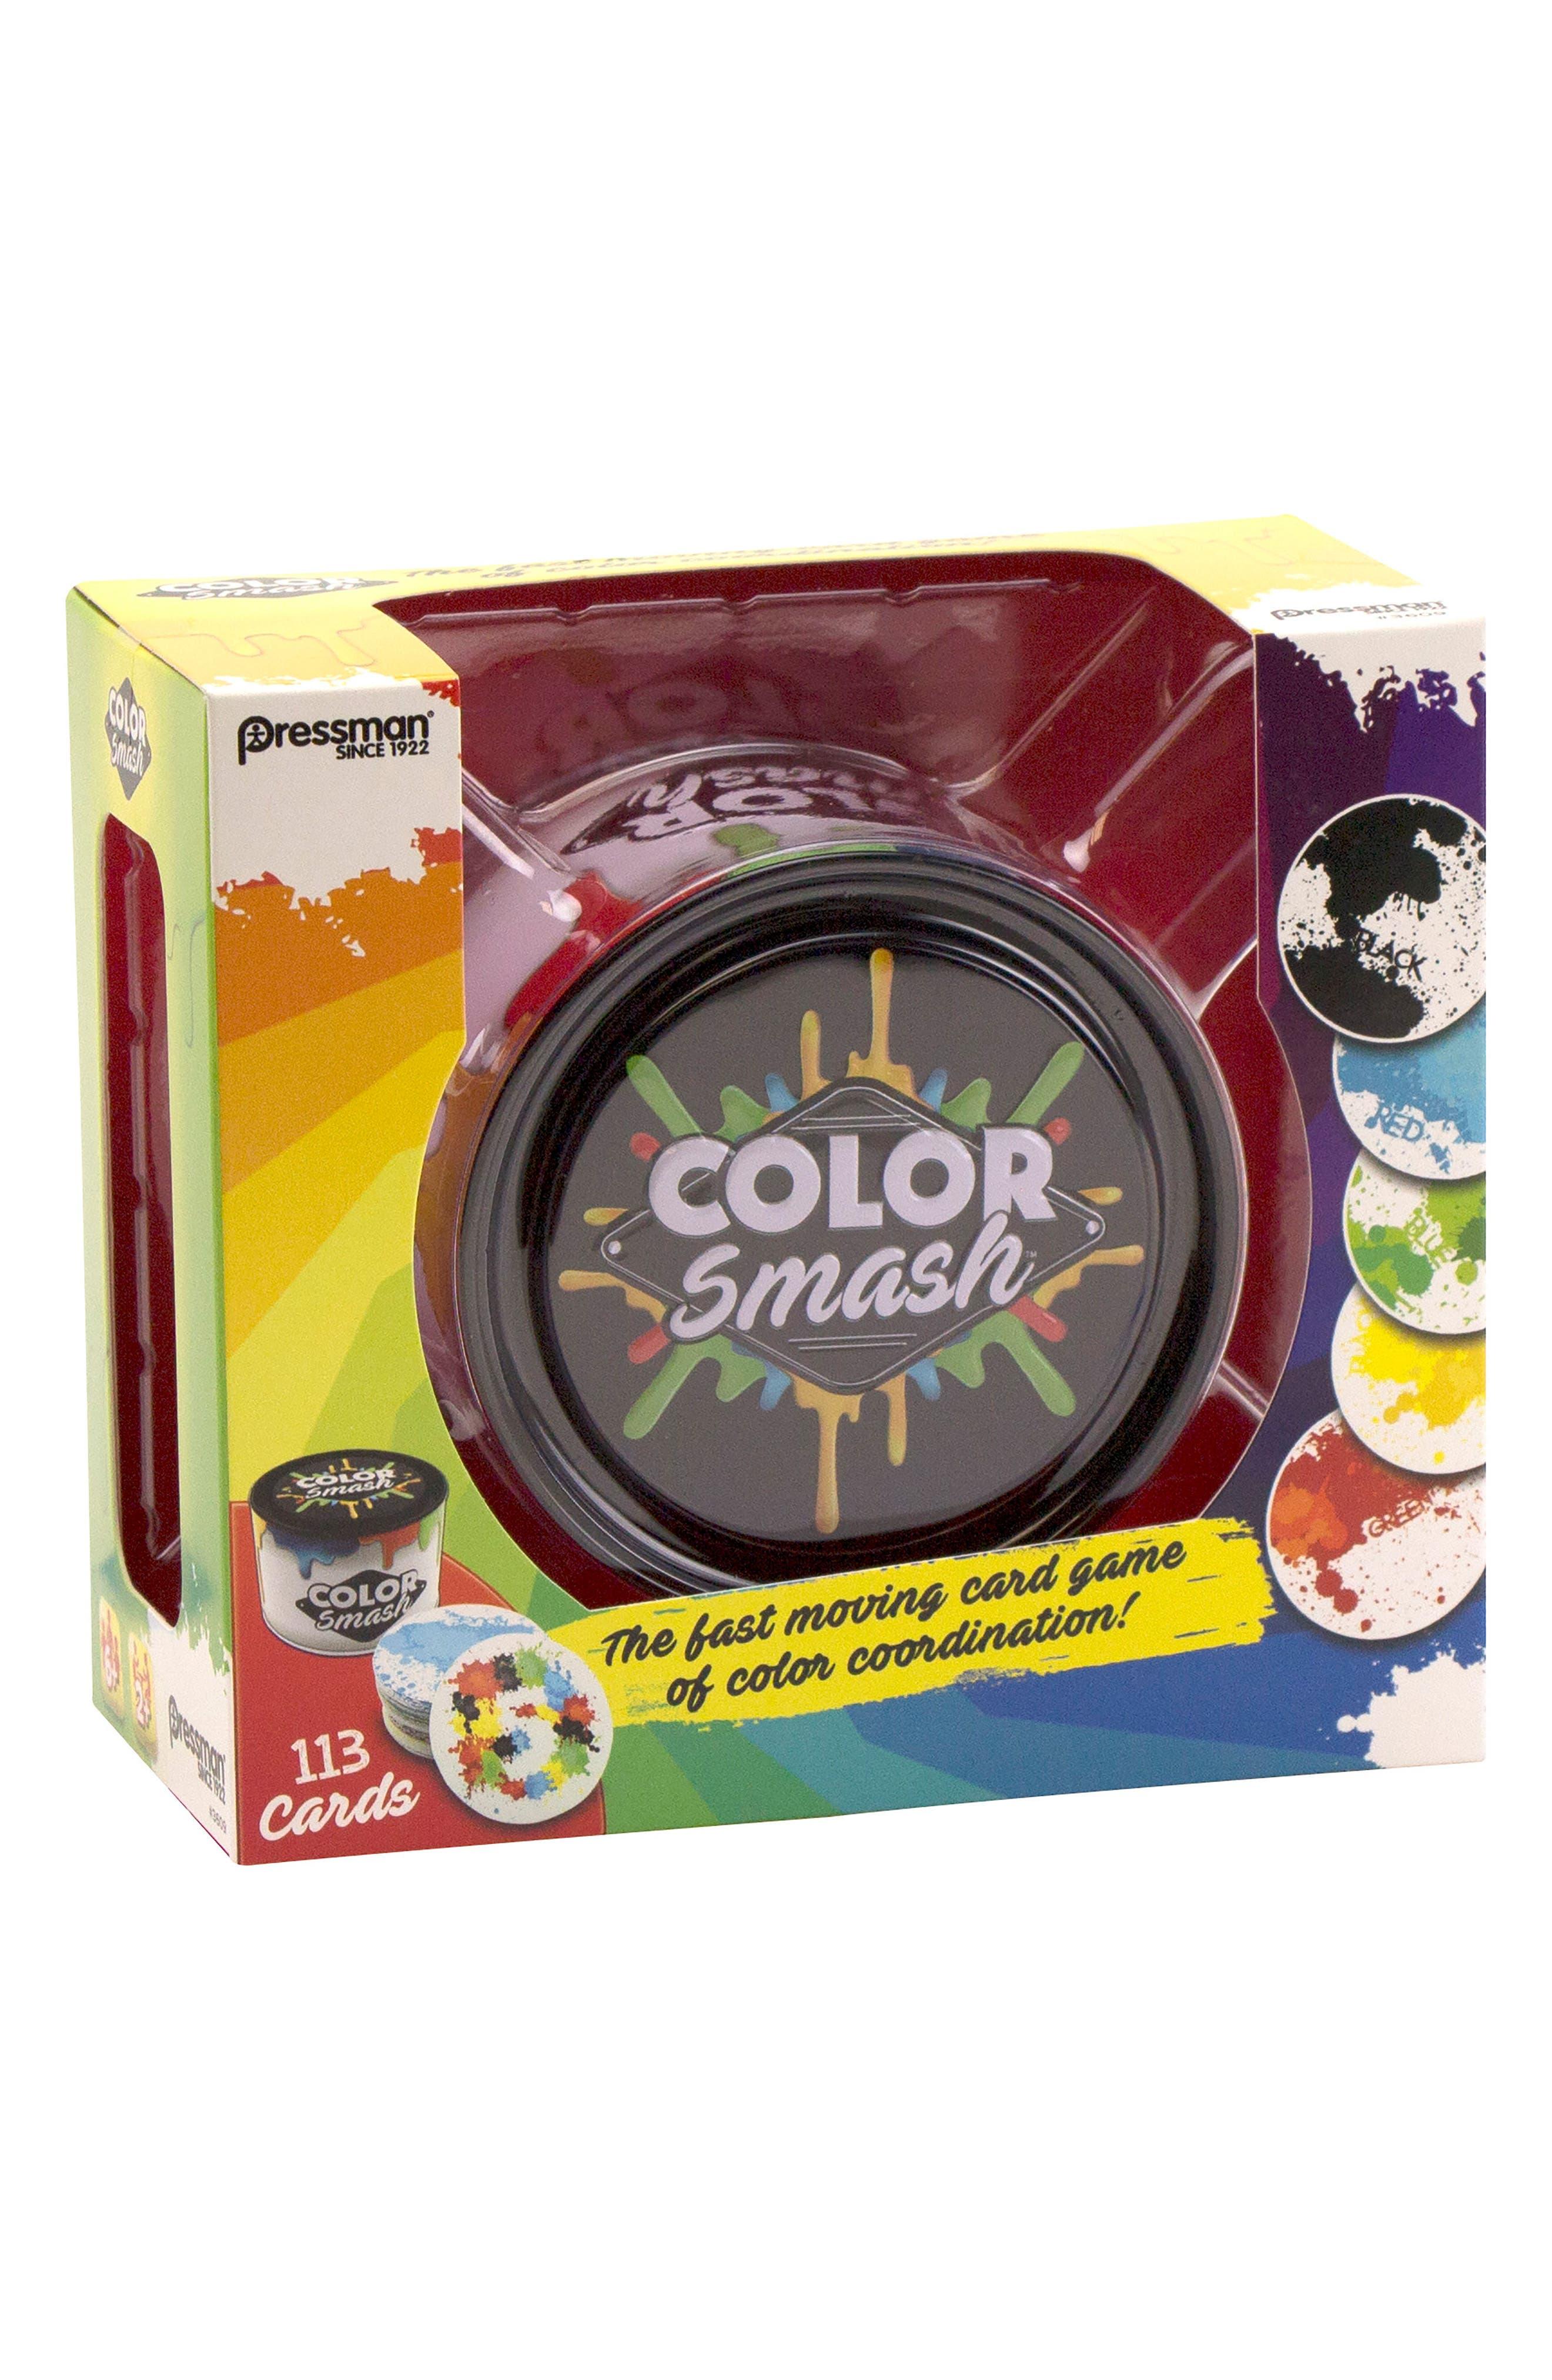 Alternate Image 1 Selected - Pressman Toy Color Smash Card Game